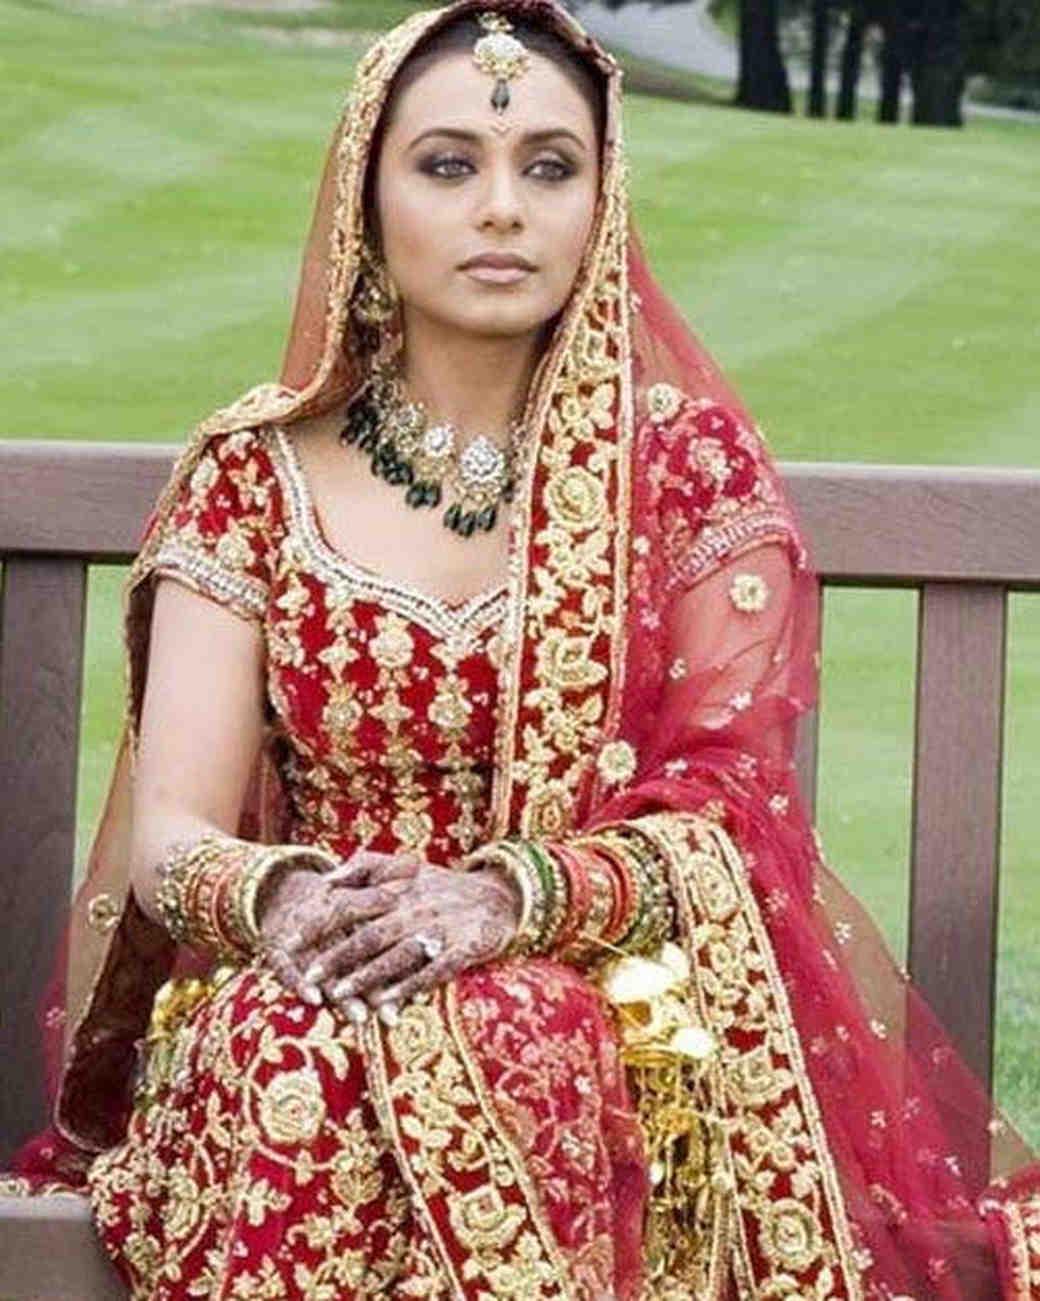 movie-wedding-dresses-kabhi-alvida-naa-kehna-rani-mukerji-0316.jpg